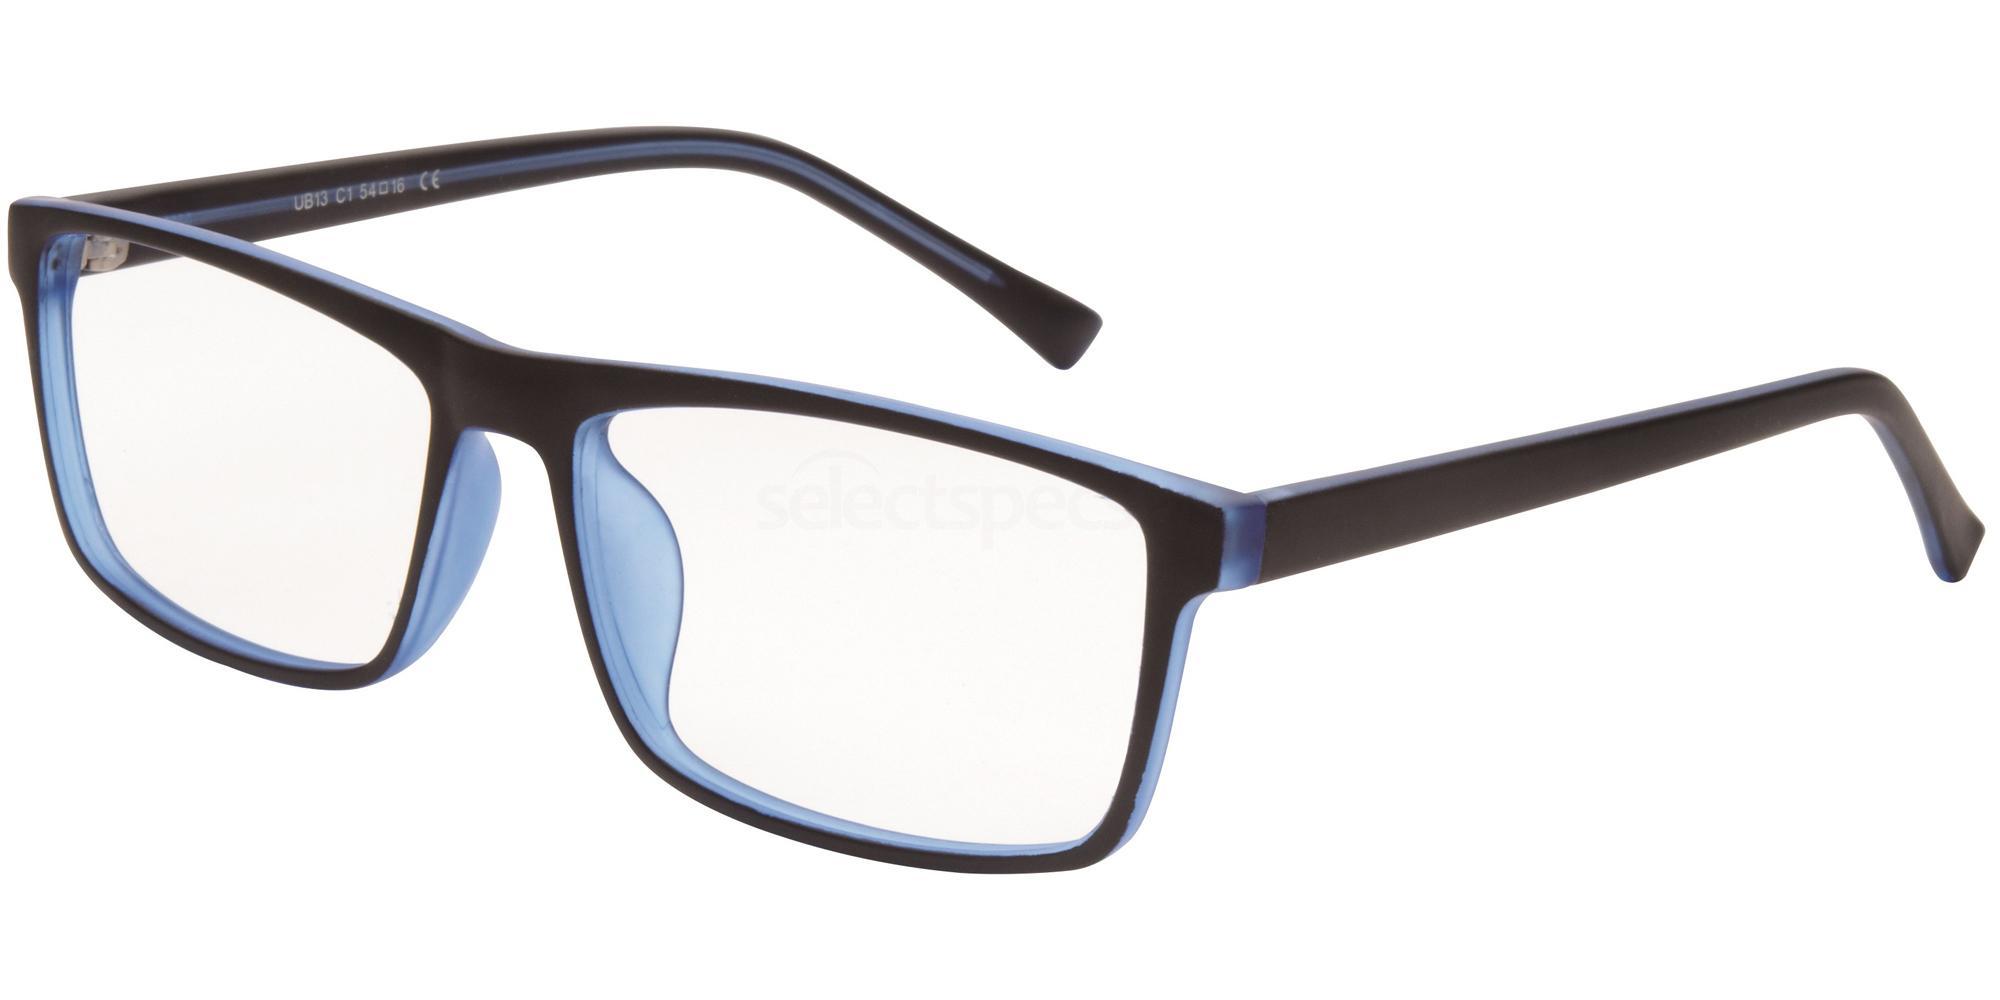 C1 UB13 Glasses, Univo Base